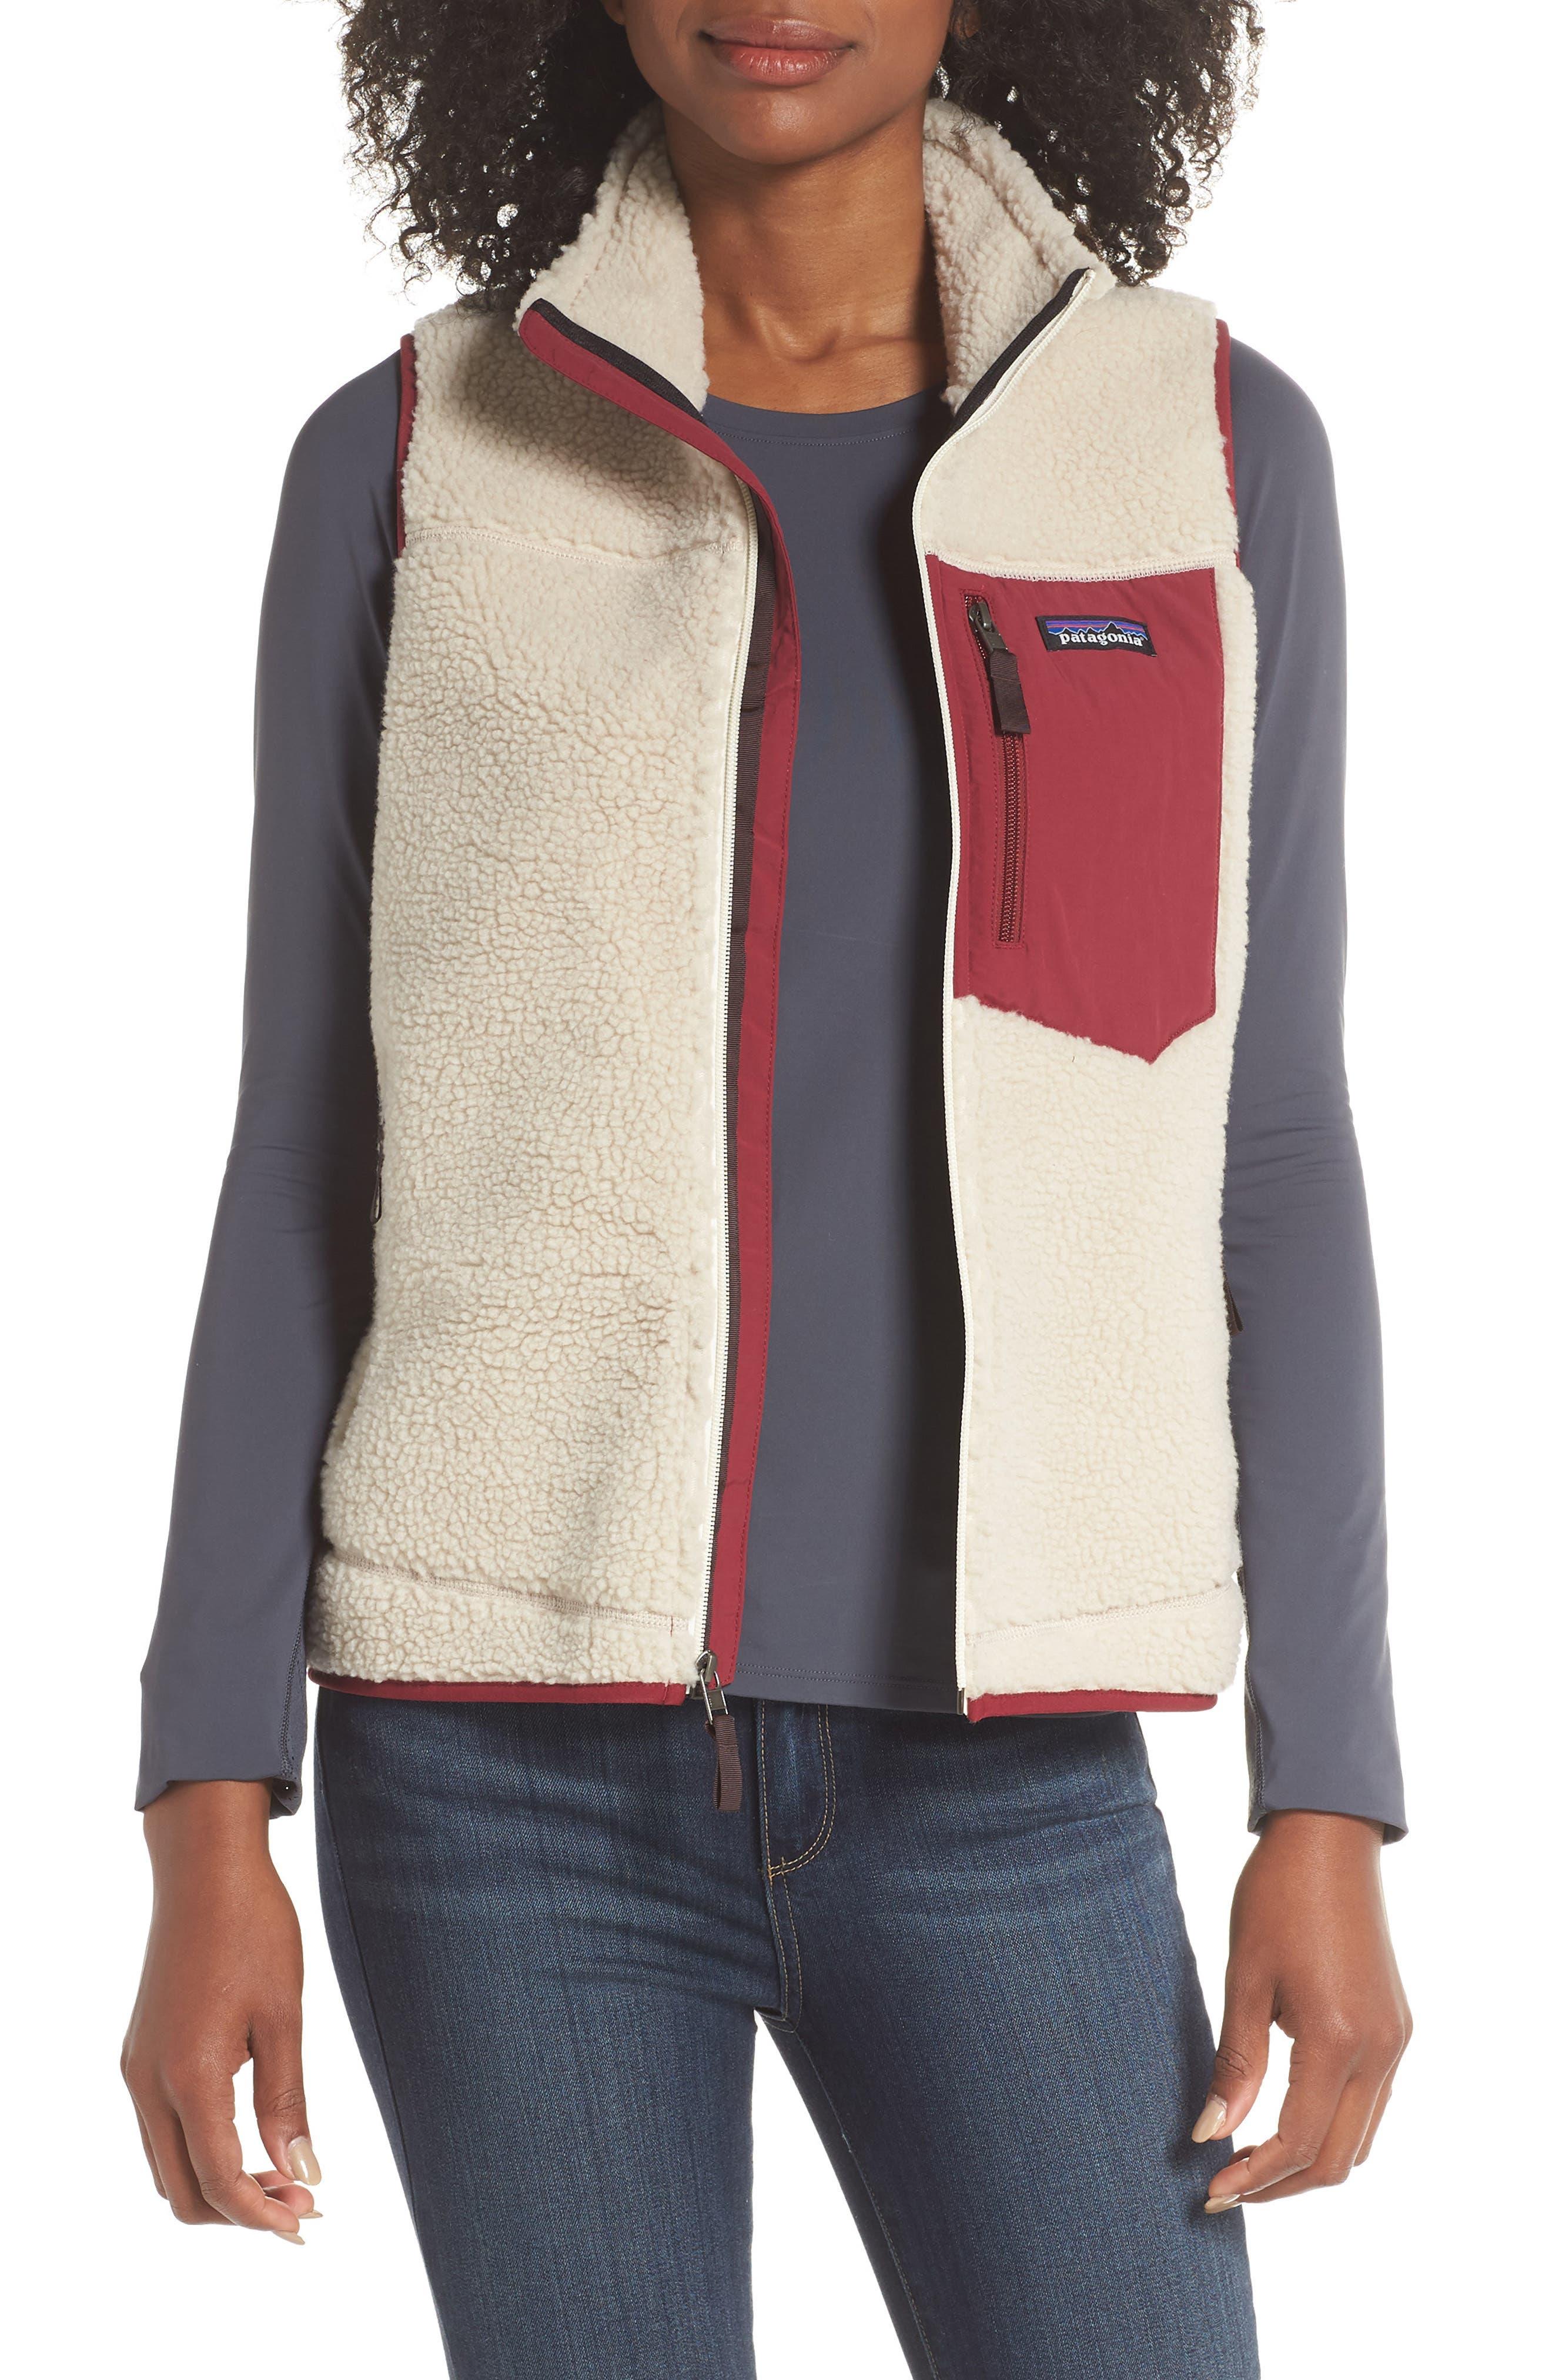 Classic Retro-X<sup>®</sup> Fleece Vest,                             Main thumbnail 1, color,                             NATURAL W/ ARROW RED